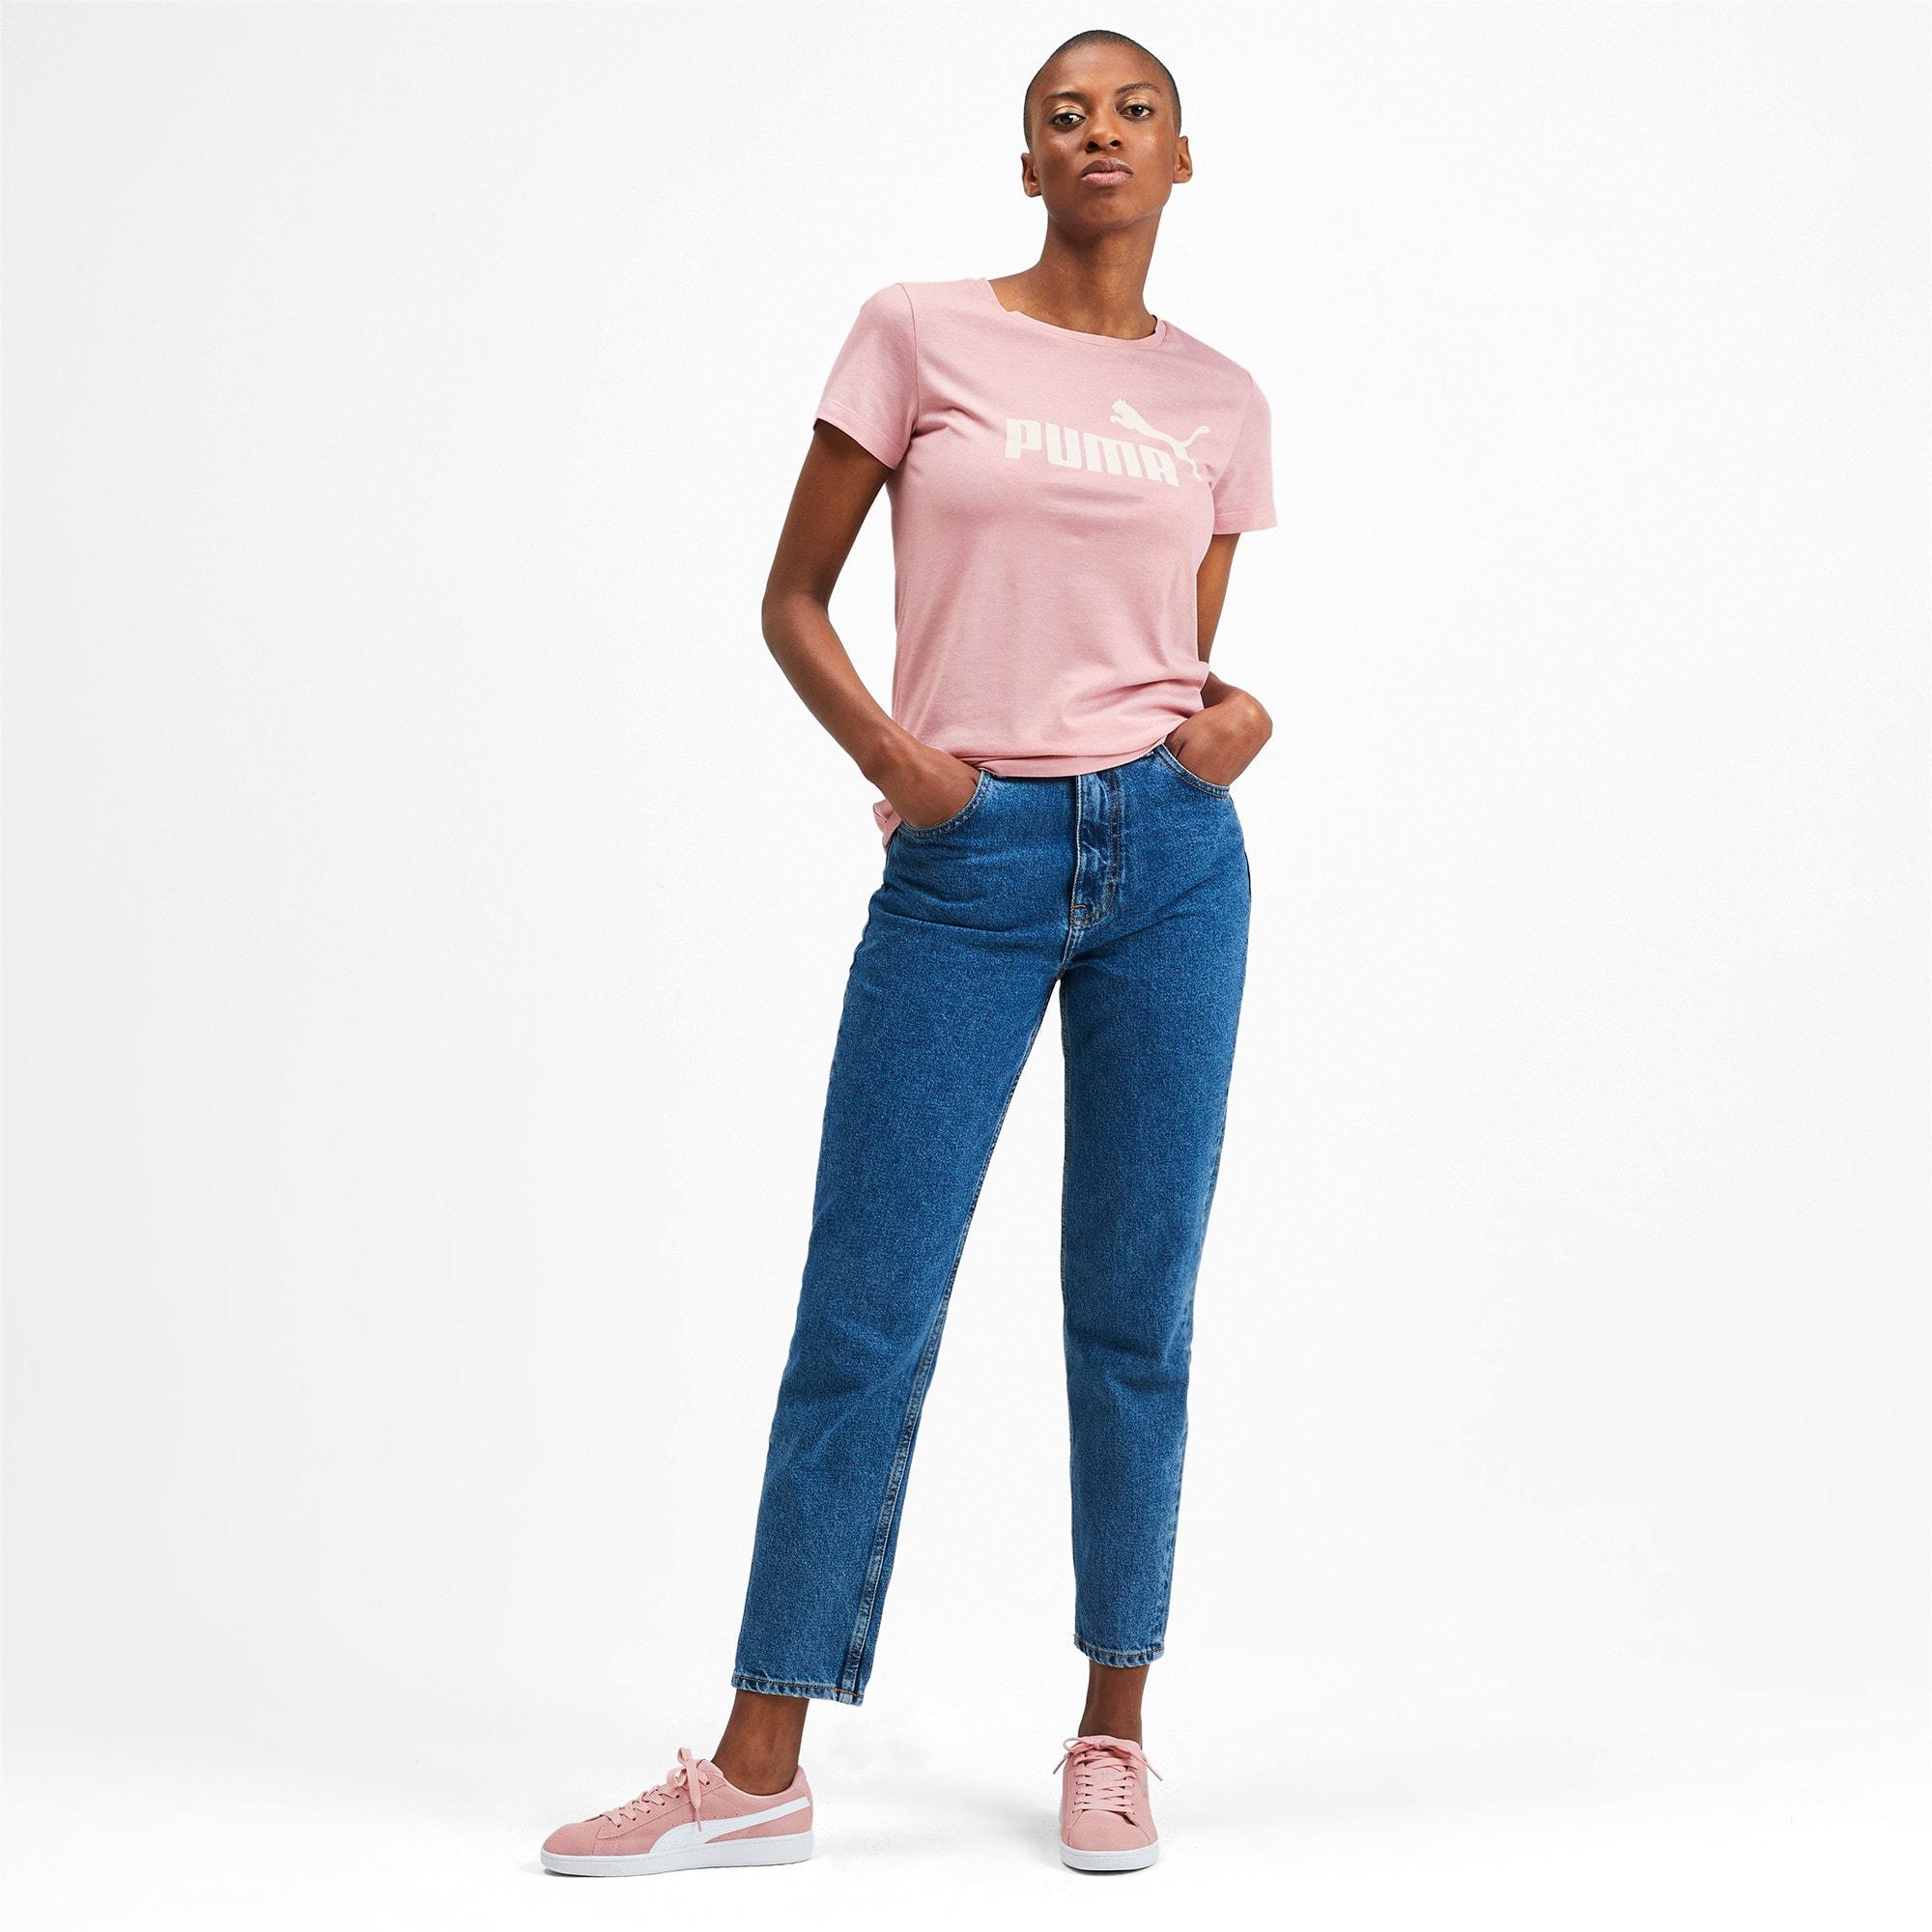 Thumbnail 3 of Essentials Heather Damen T-Shirt, Bridal Rose, medium